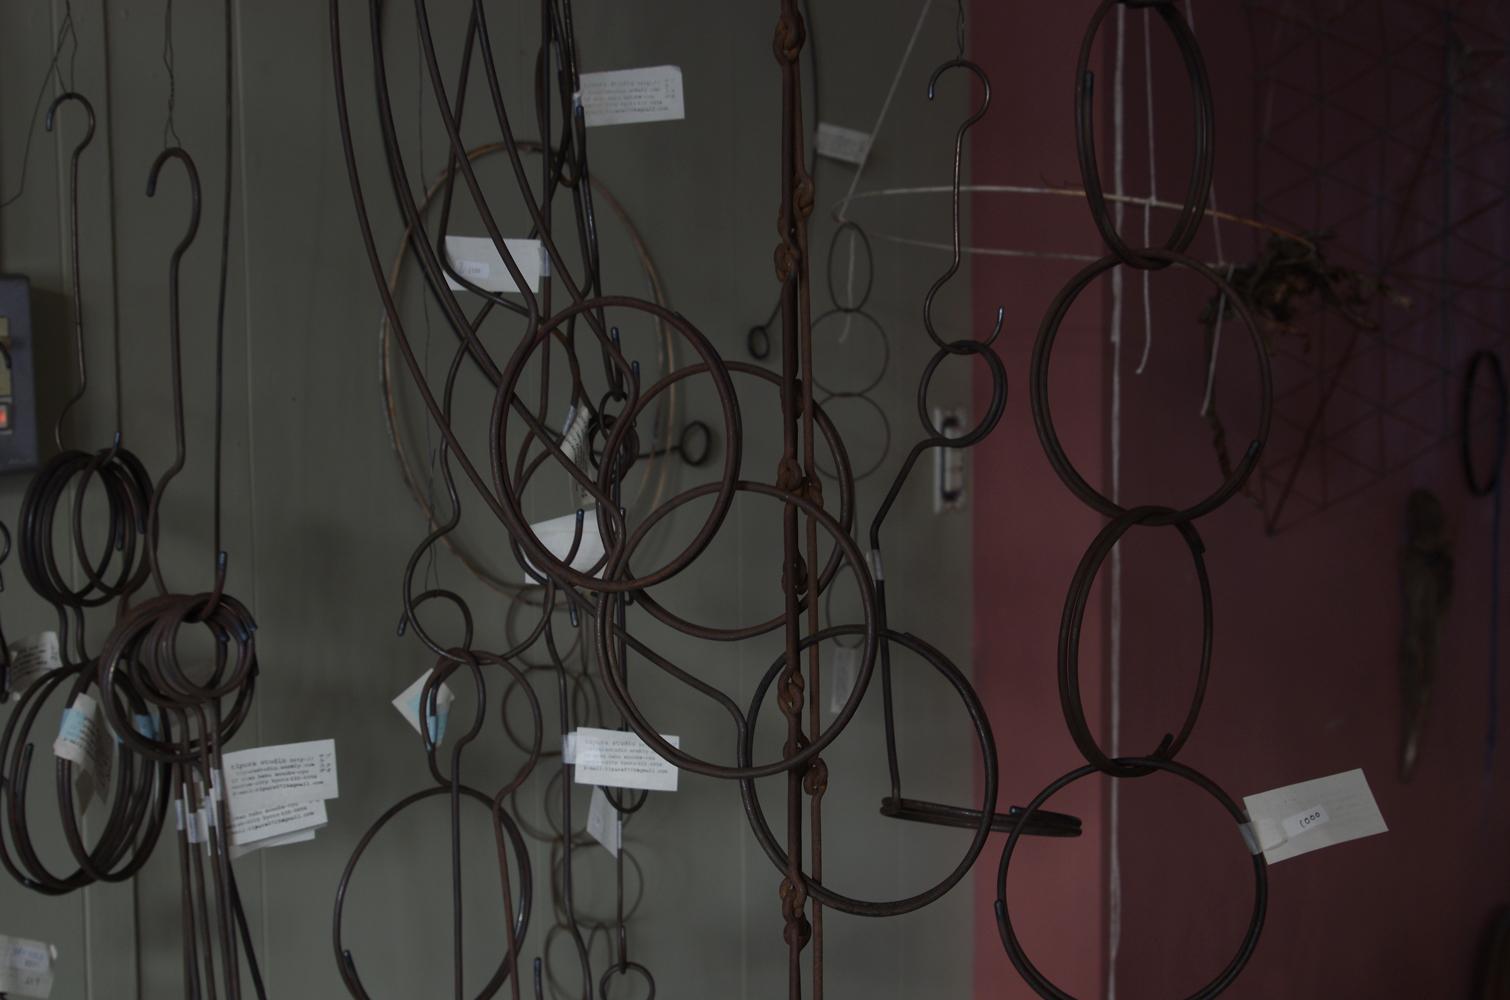 tipura-studio-ironworks-exhibition-40